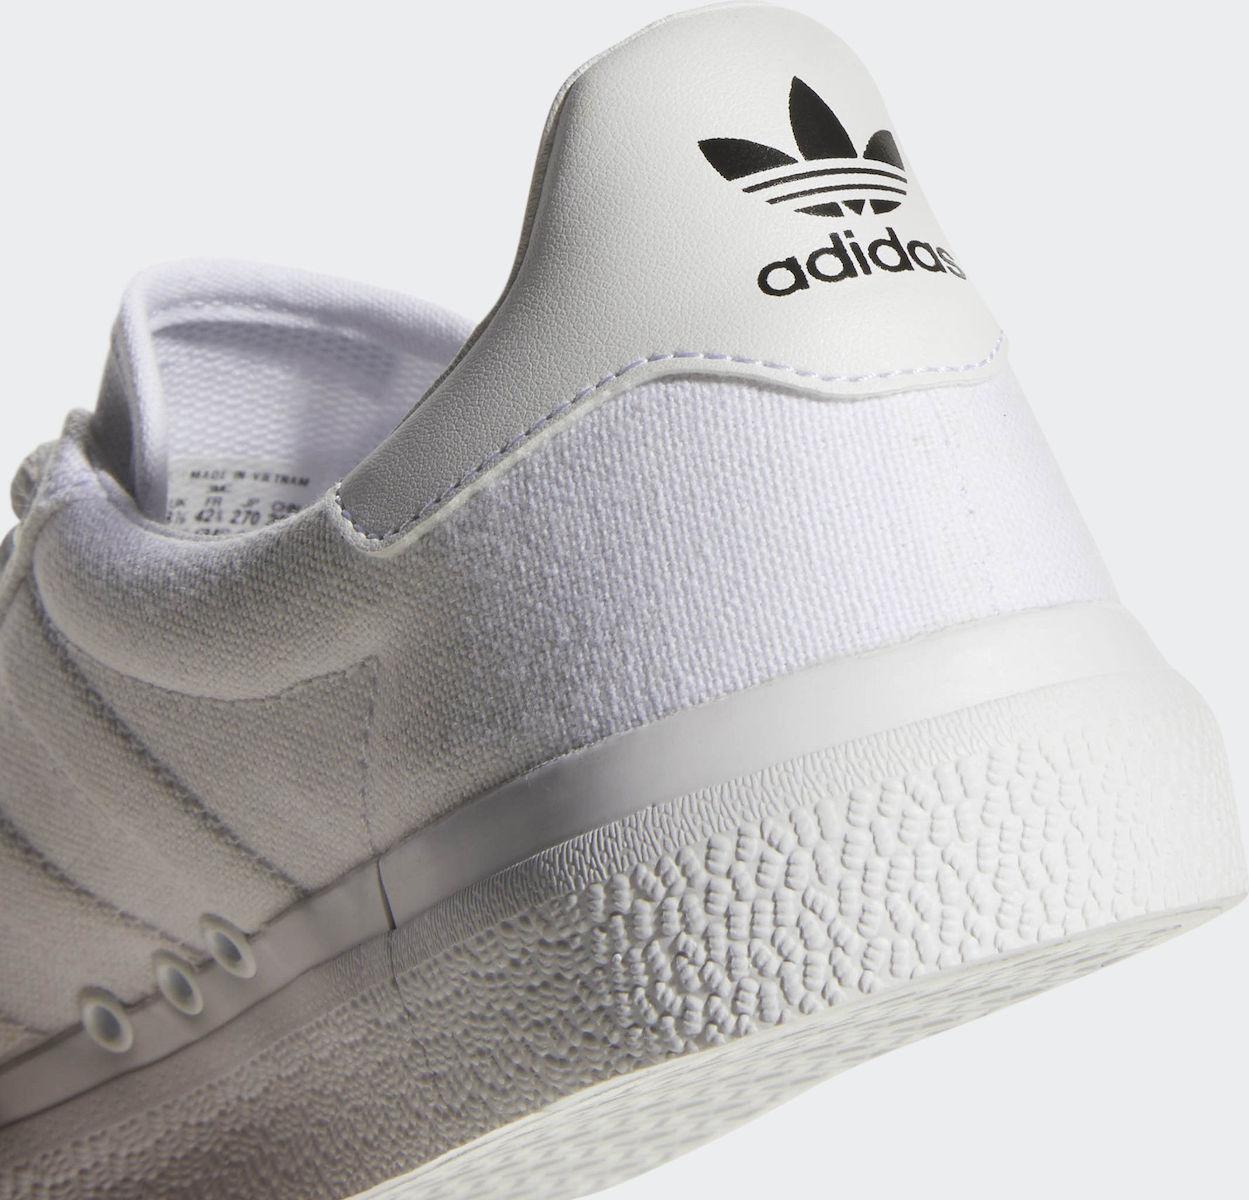 Schönen Stil Männer Schuhe adidas 3mc B22707 ConavyConavy